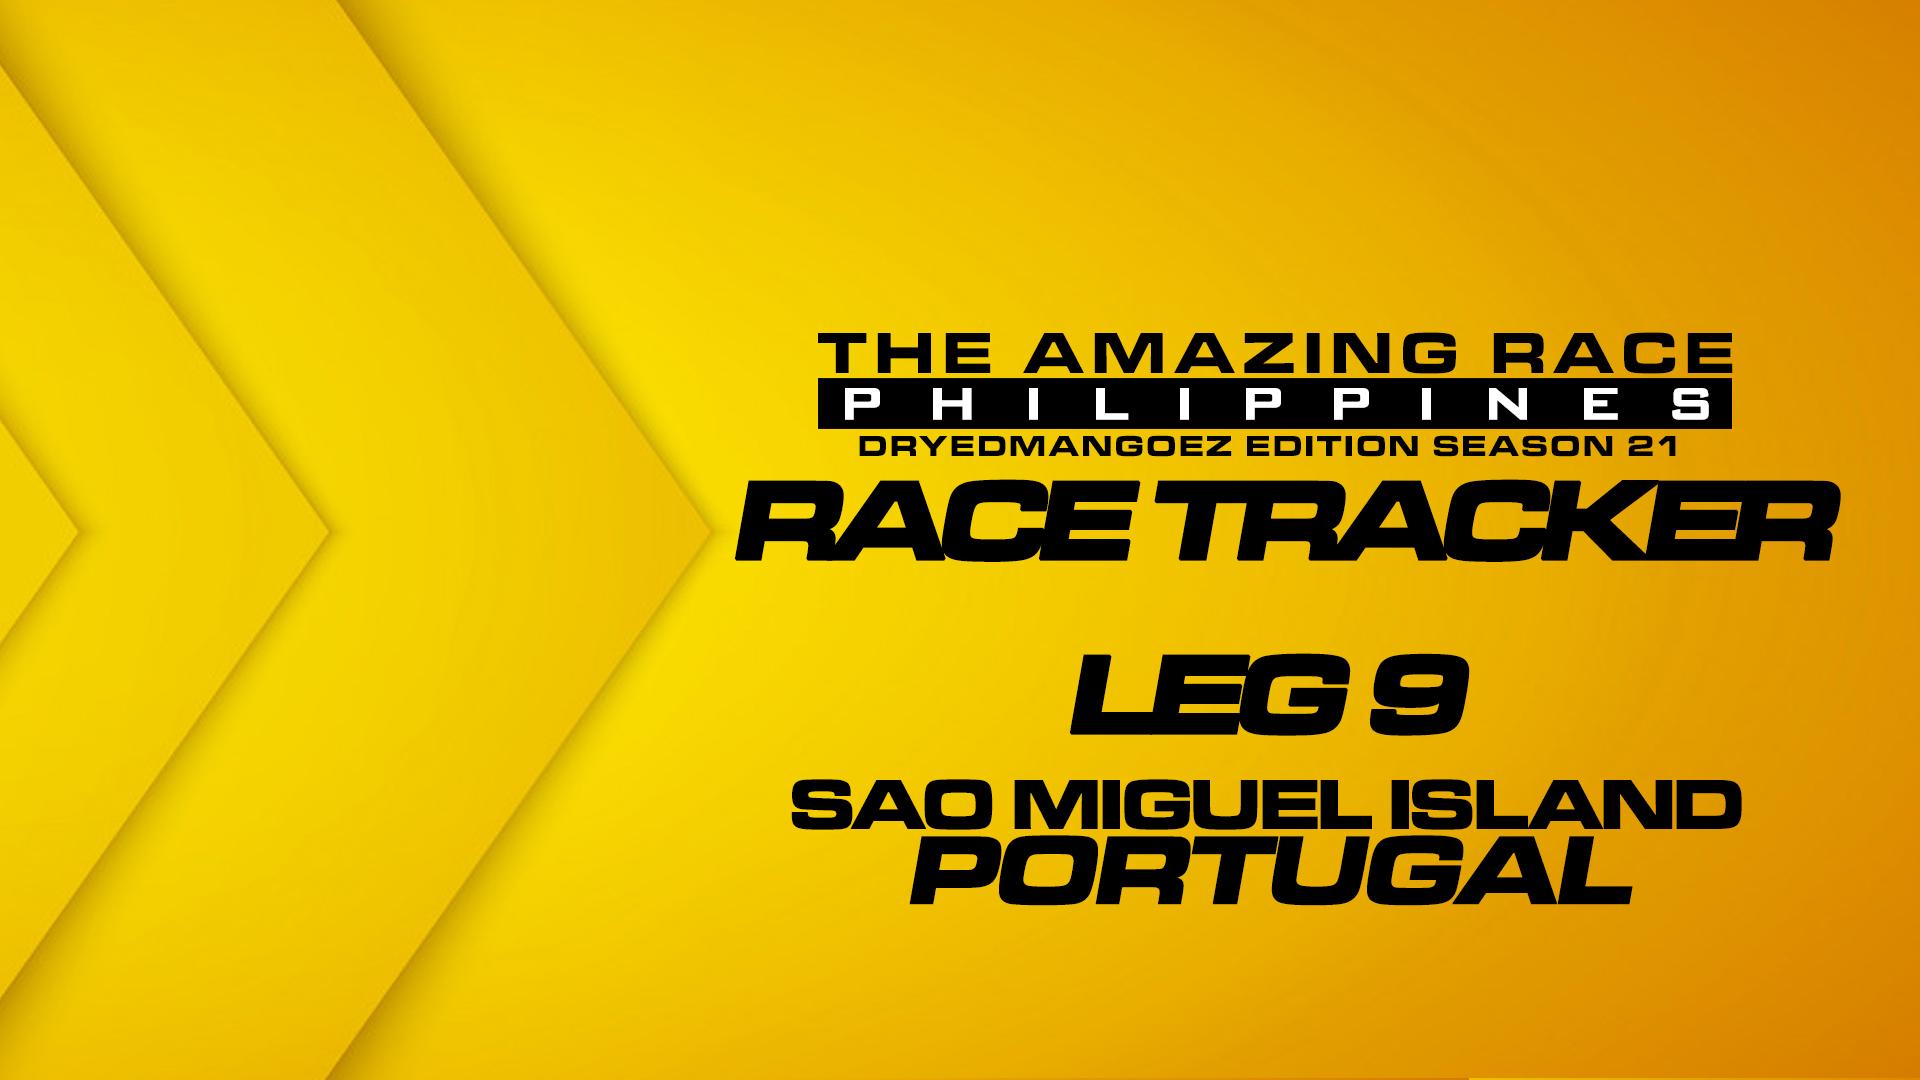 The Amazing Race Philippines: DryedMangoez Edition Season 21 Race Tracker – Leg 9